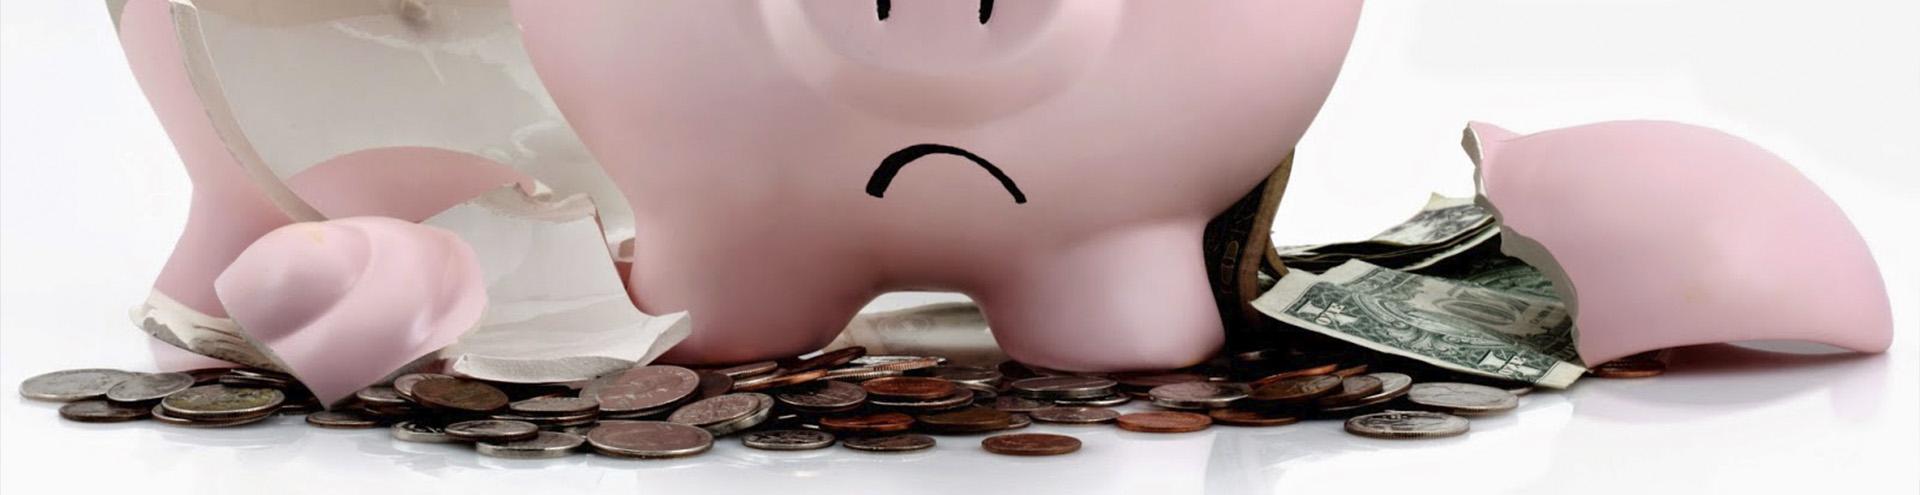 банкротство банка в Самаре и Самарской области